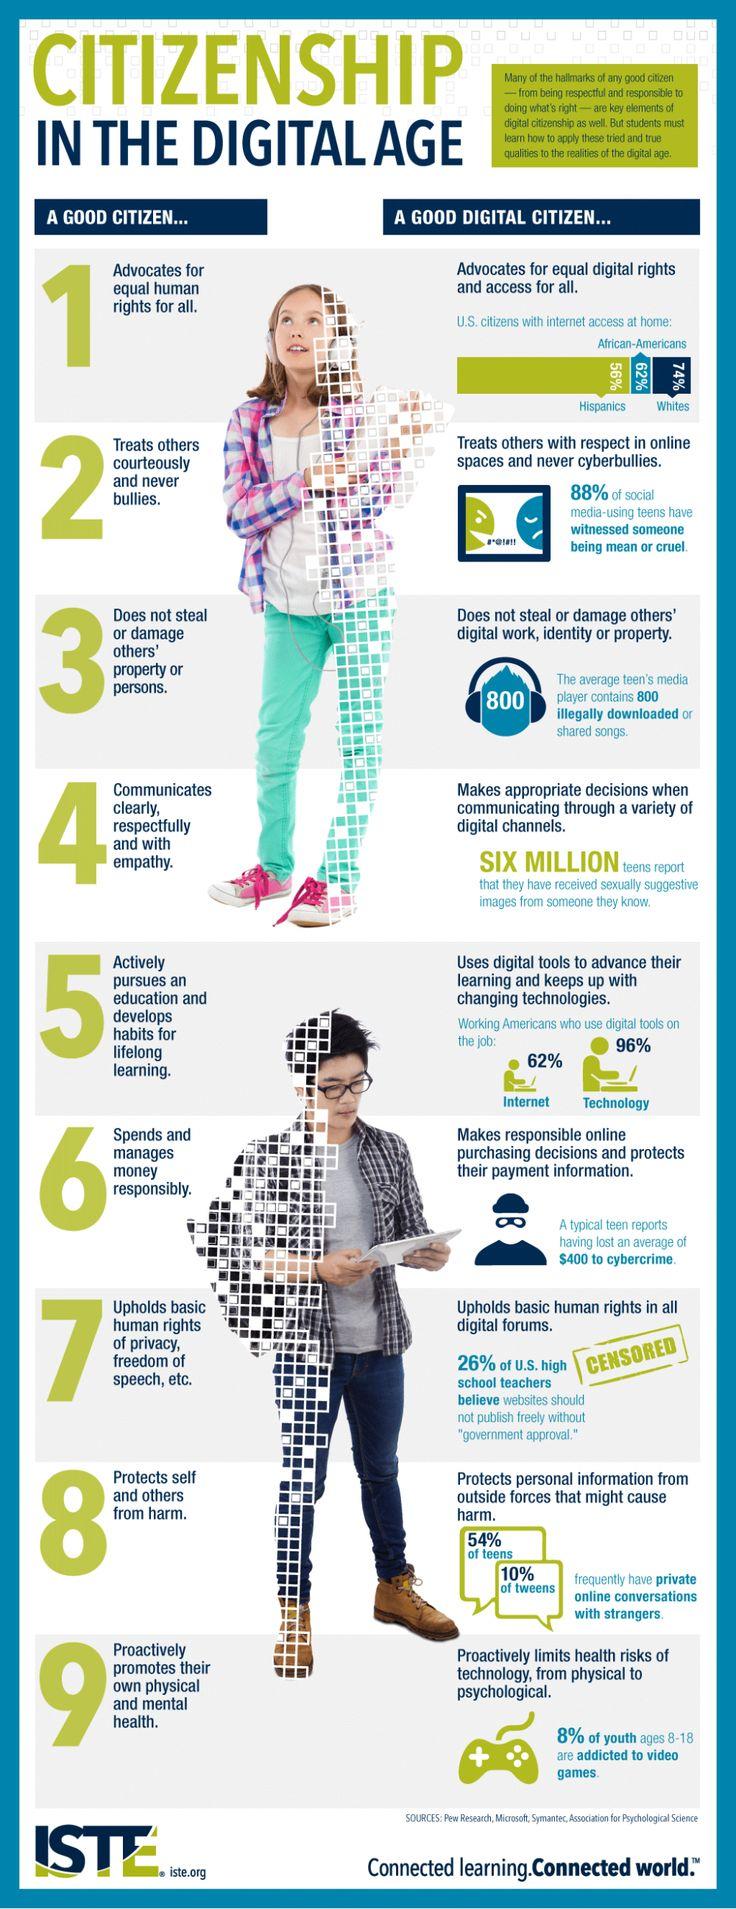 9 Traits of Good Digital Citizens